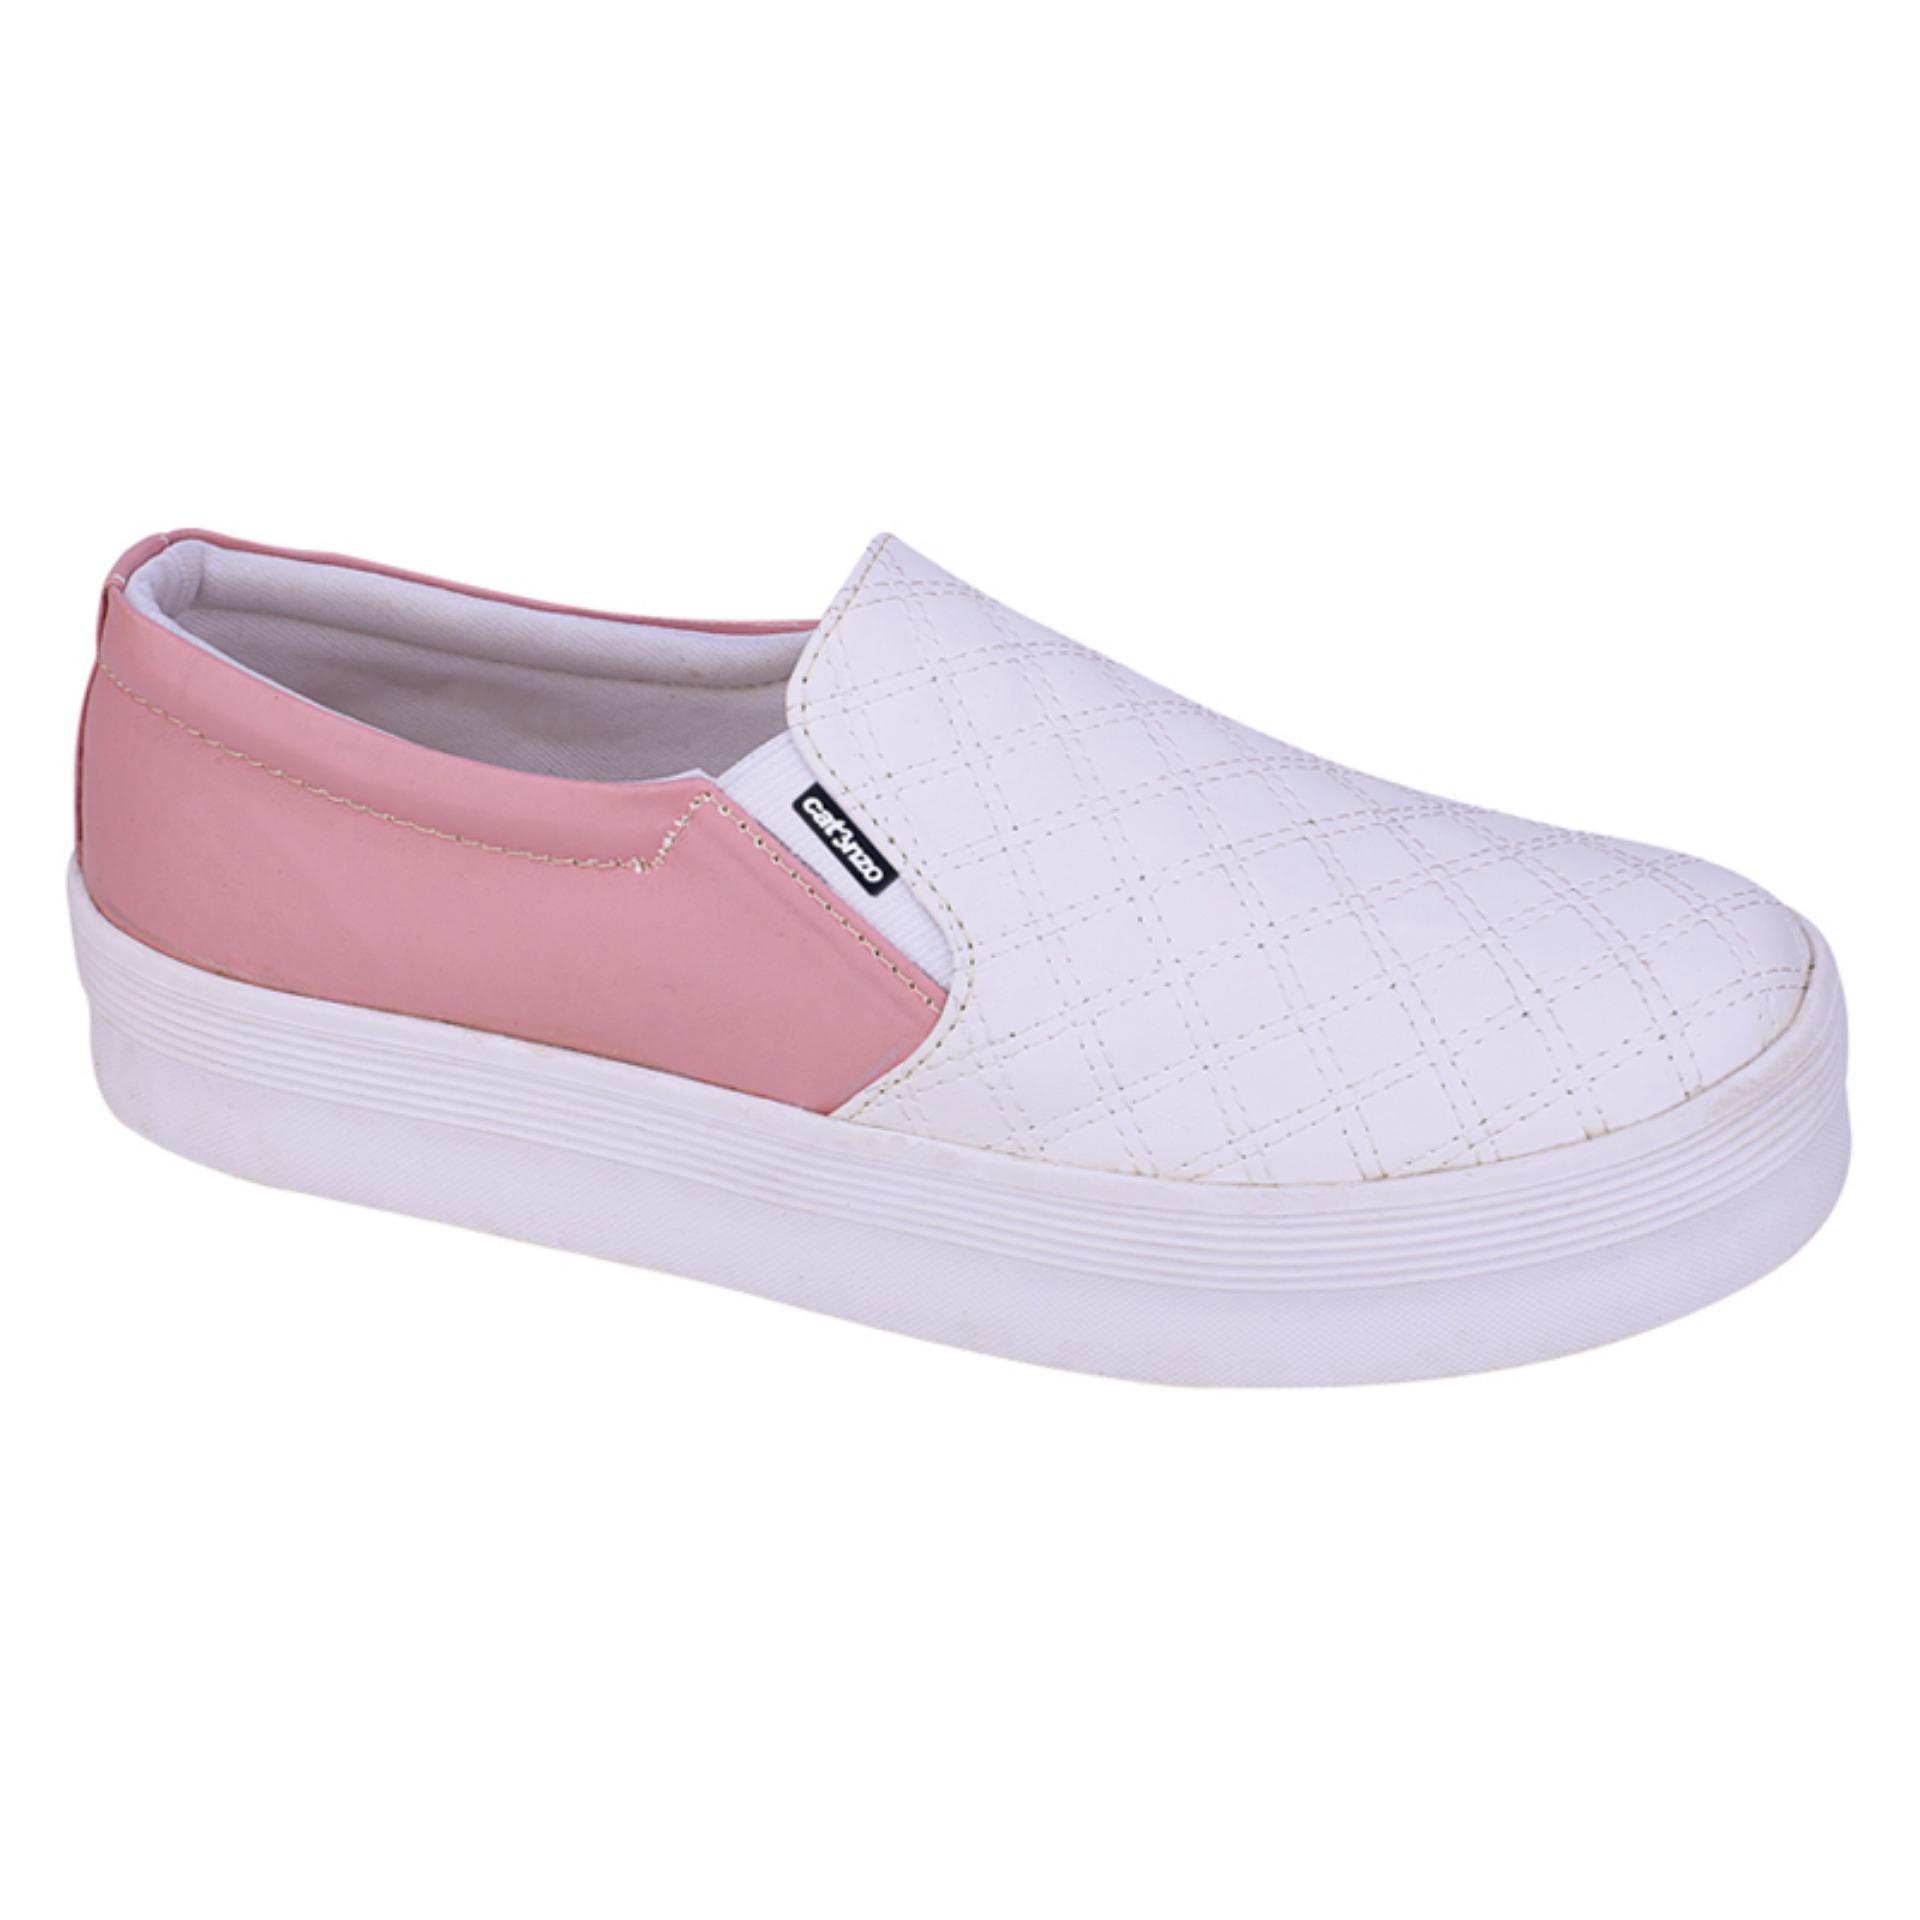 Sepatu Casual Wanita Bahan Synthetic Pink Rubber Outsole